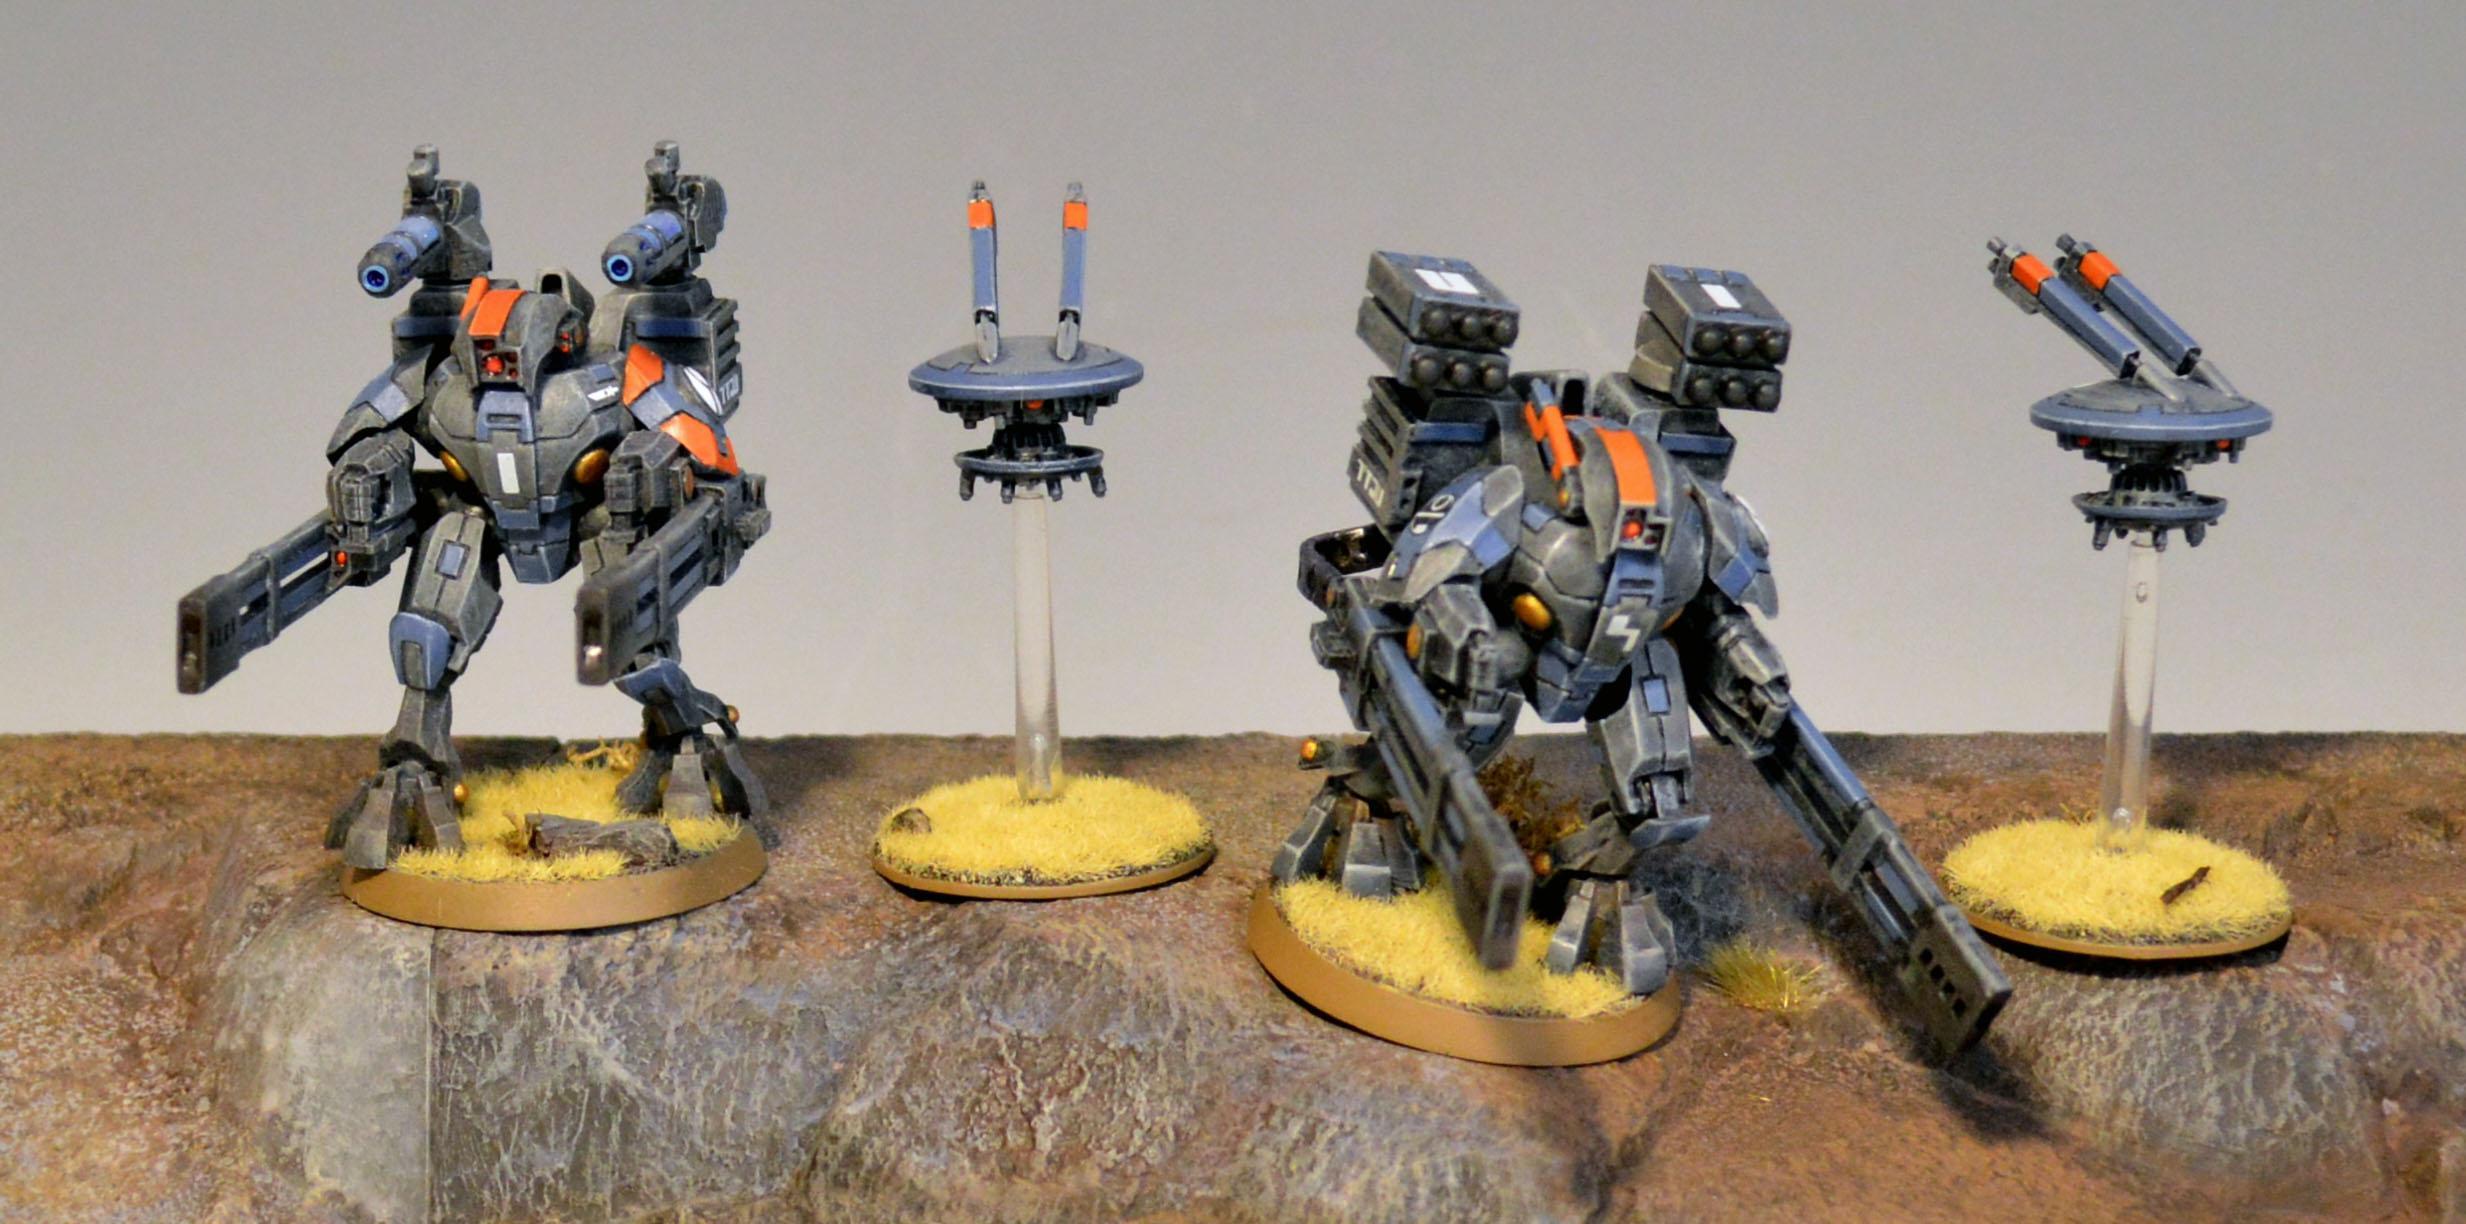 Broadsides, Xv-88, XV88 Broadside Battlesuit Team 1